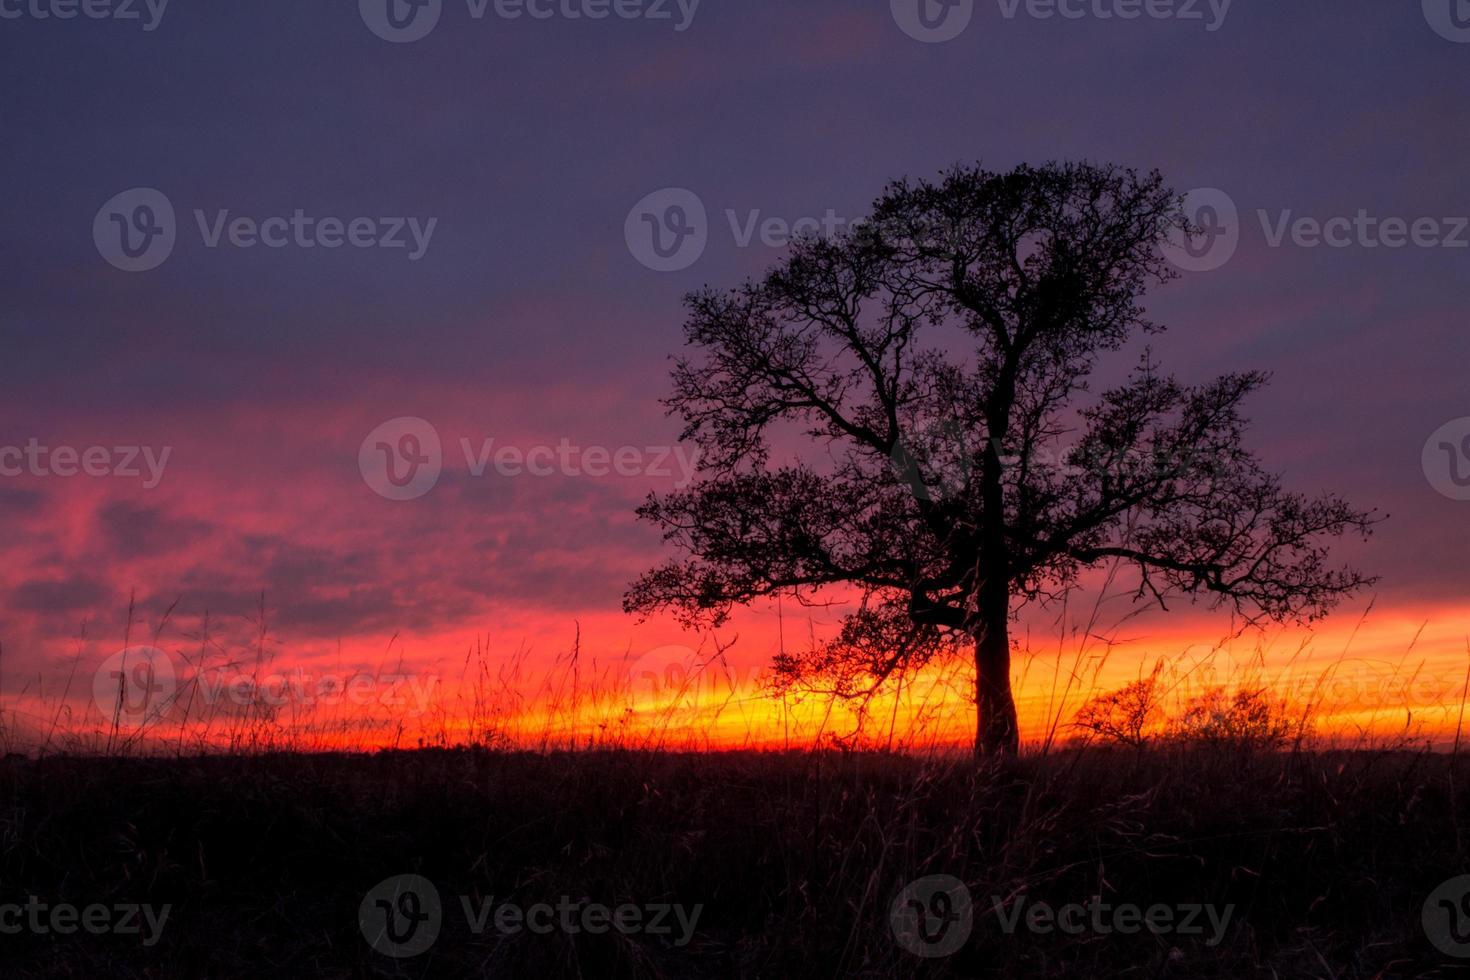 ek träd solnedgång foto